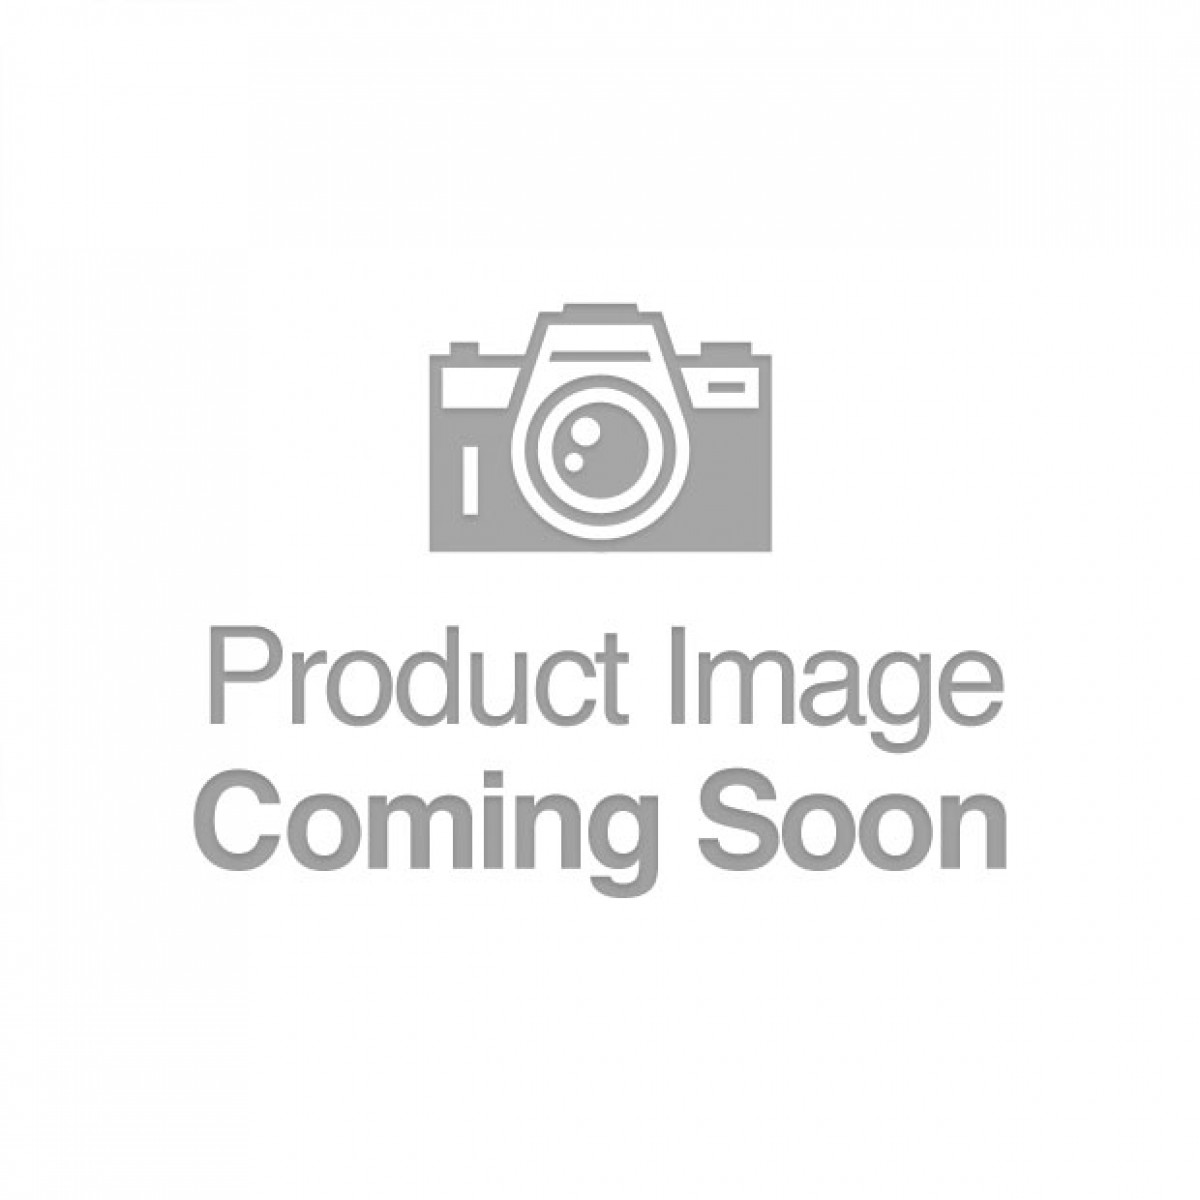 Intimate Earth Mojo Horny Goat Weed Libido Warming Glide - 4 oz